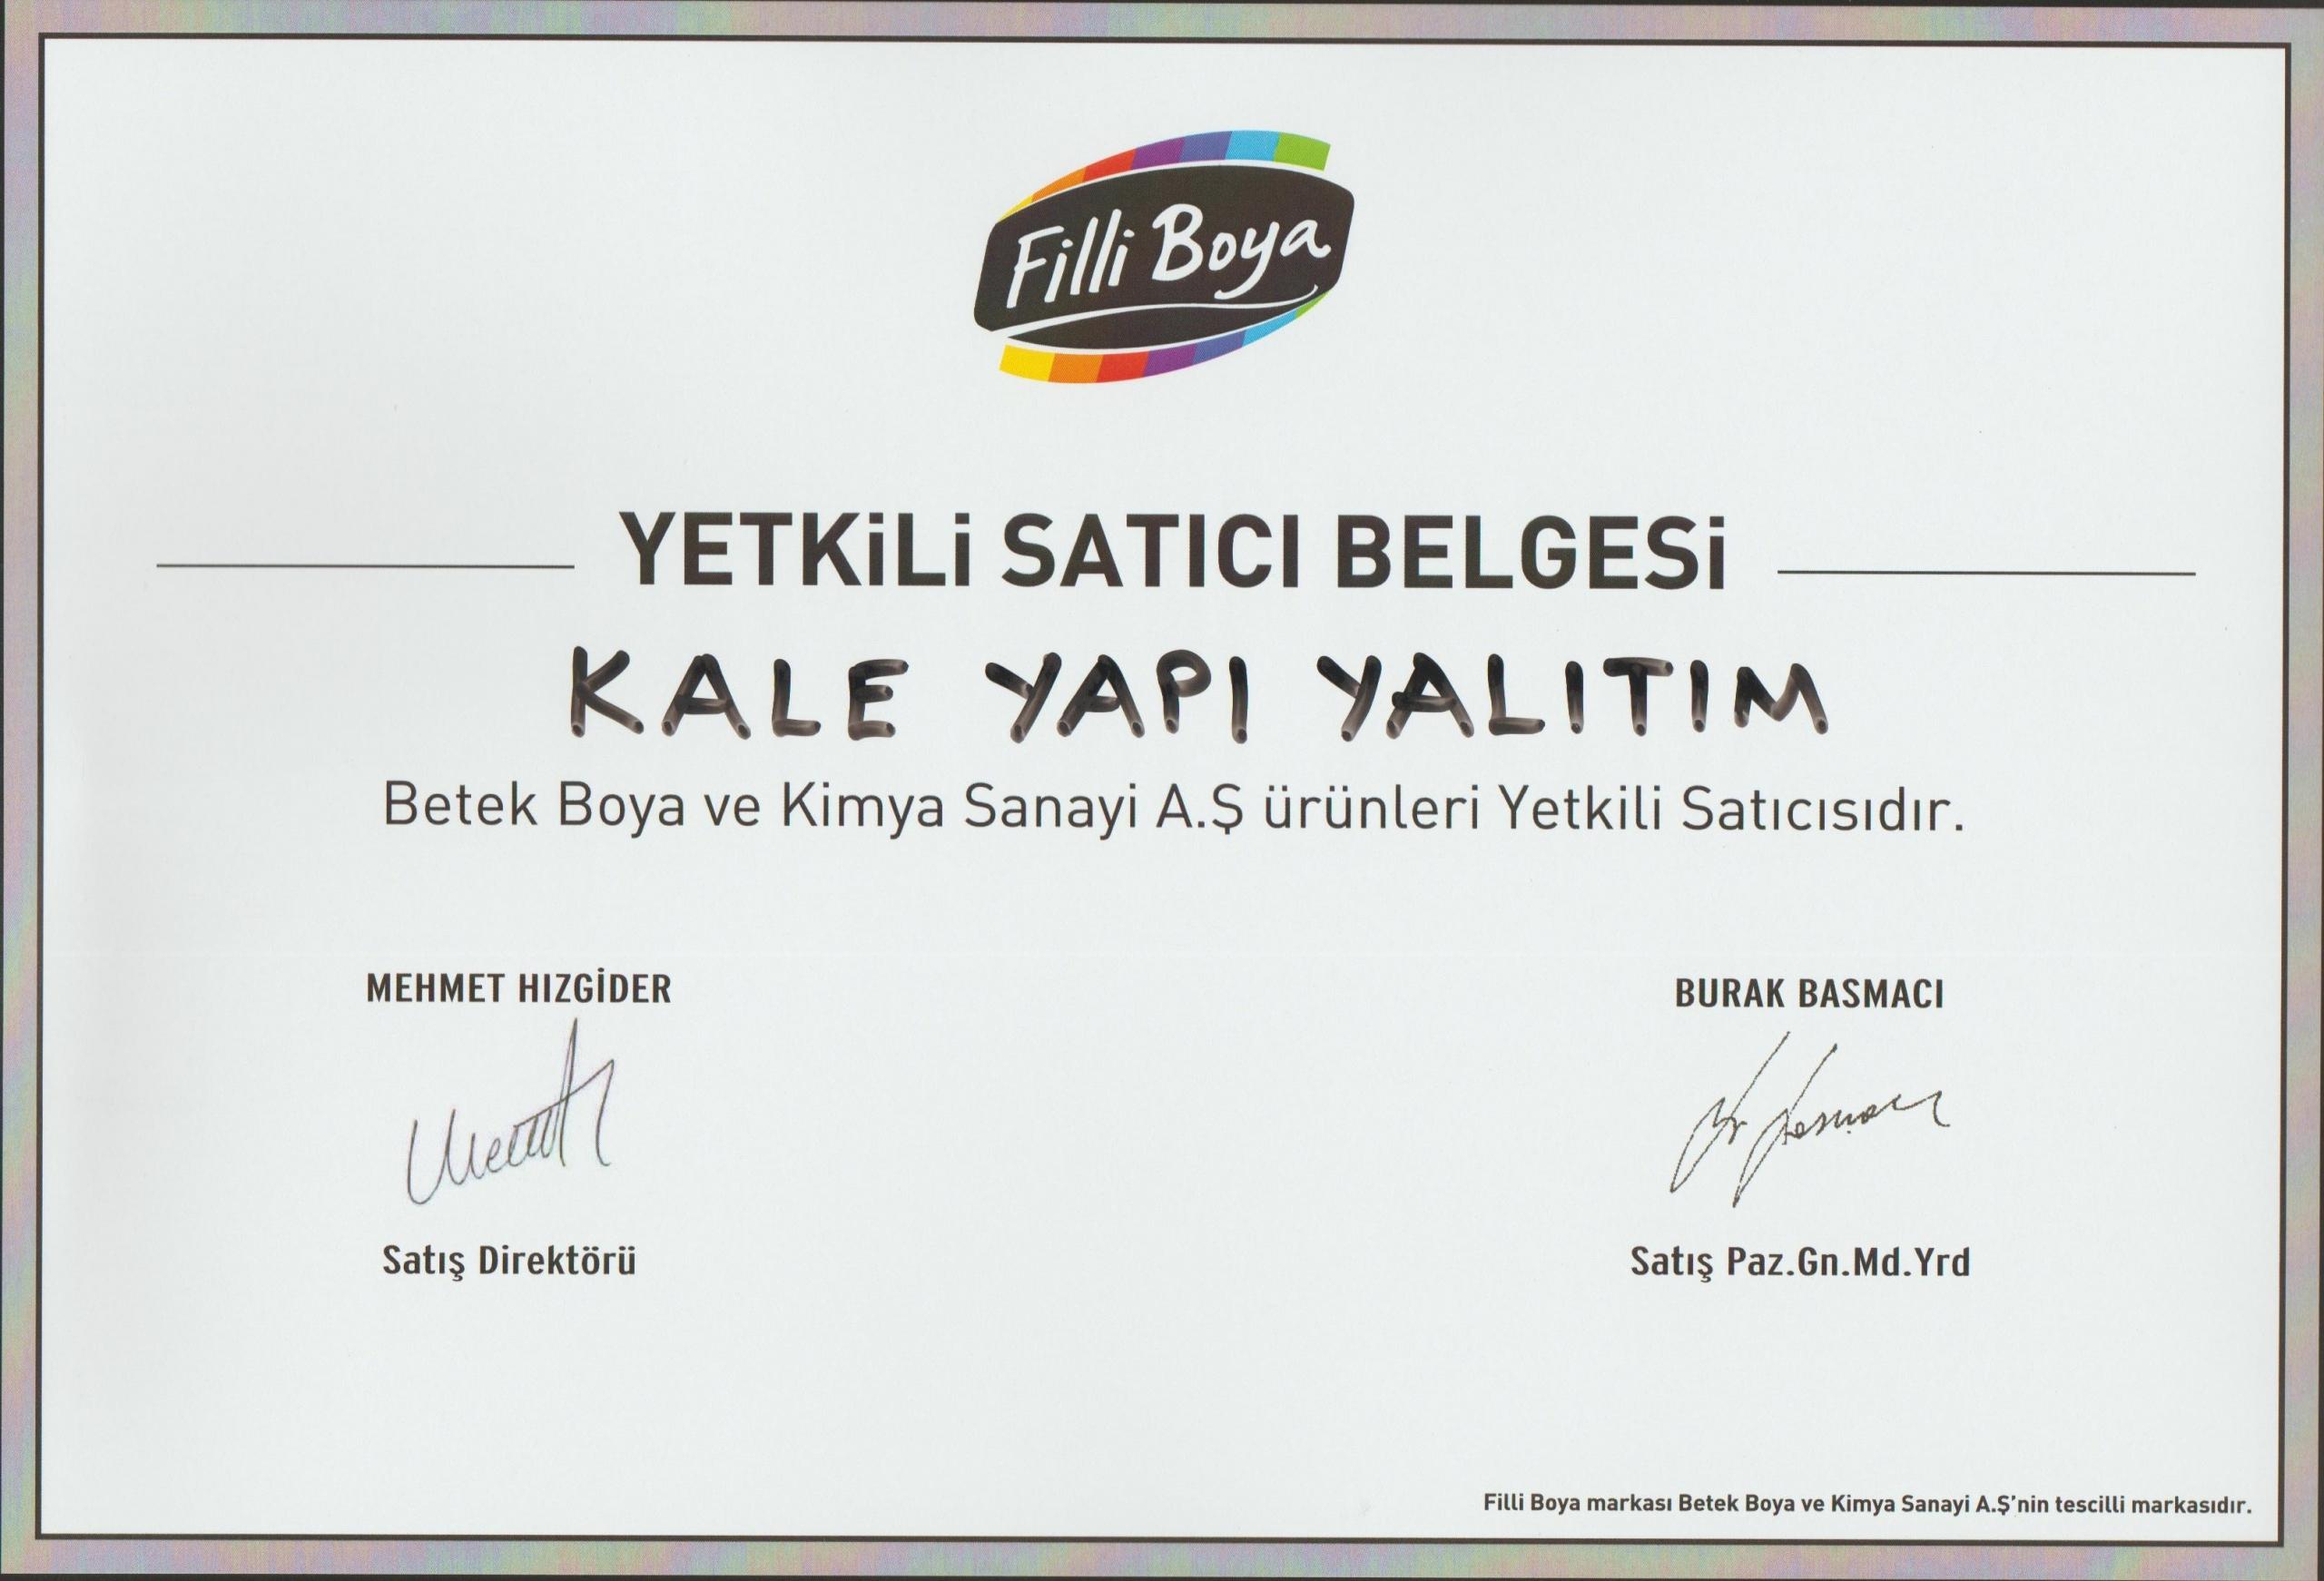 FİLLİ BOYA BAYİİ